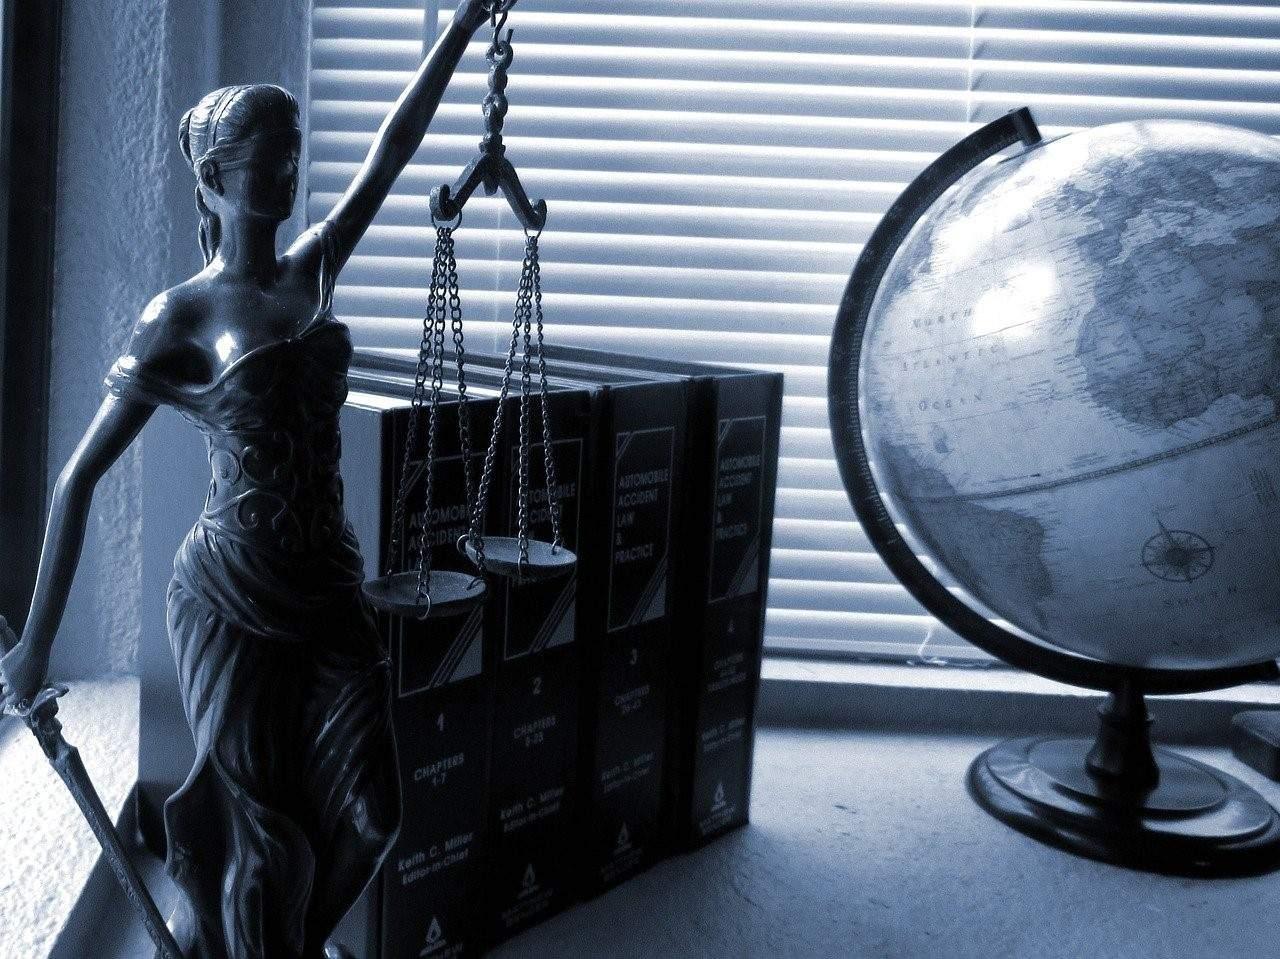 An attorney's desk